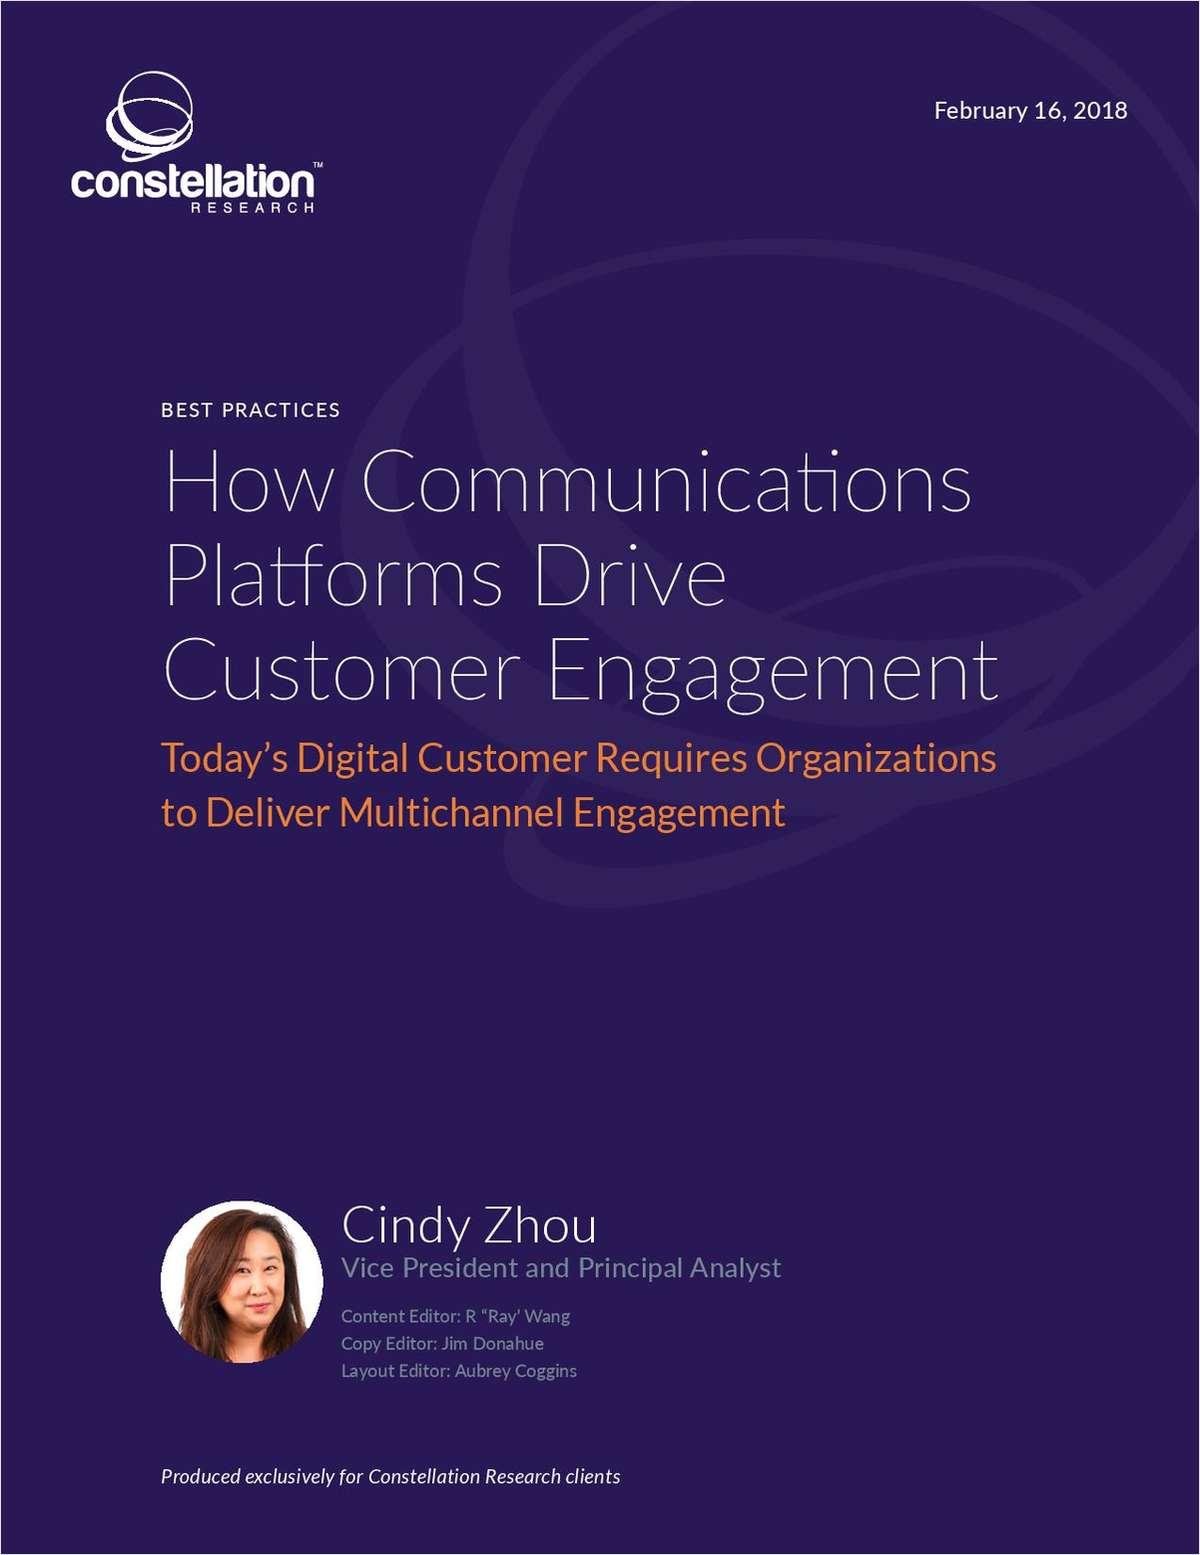 How Communications Platforms Drive Customer Engagement